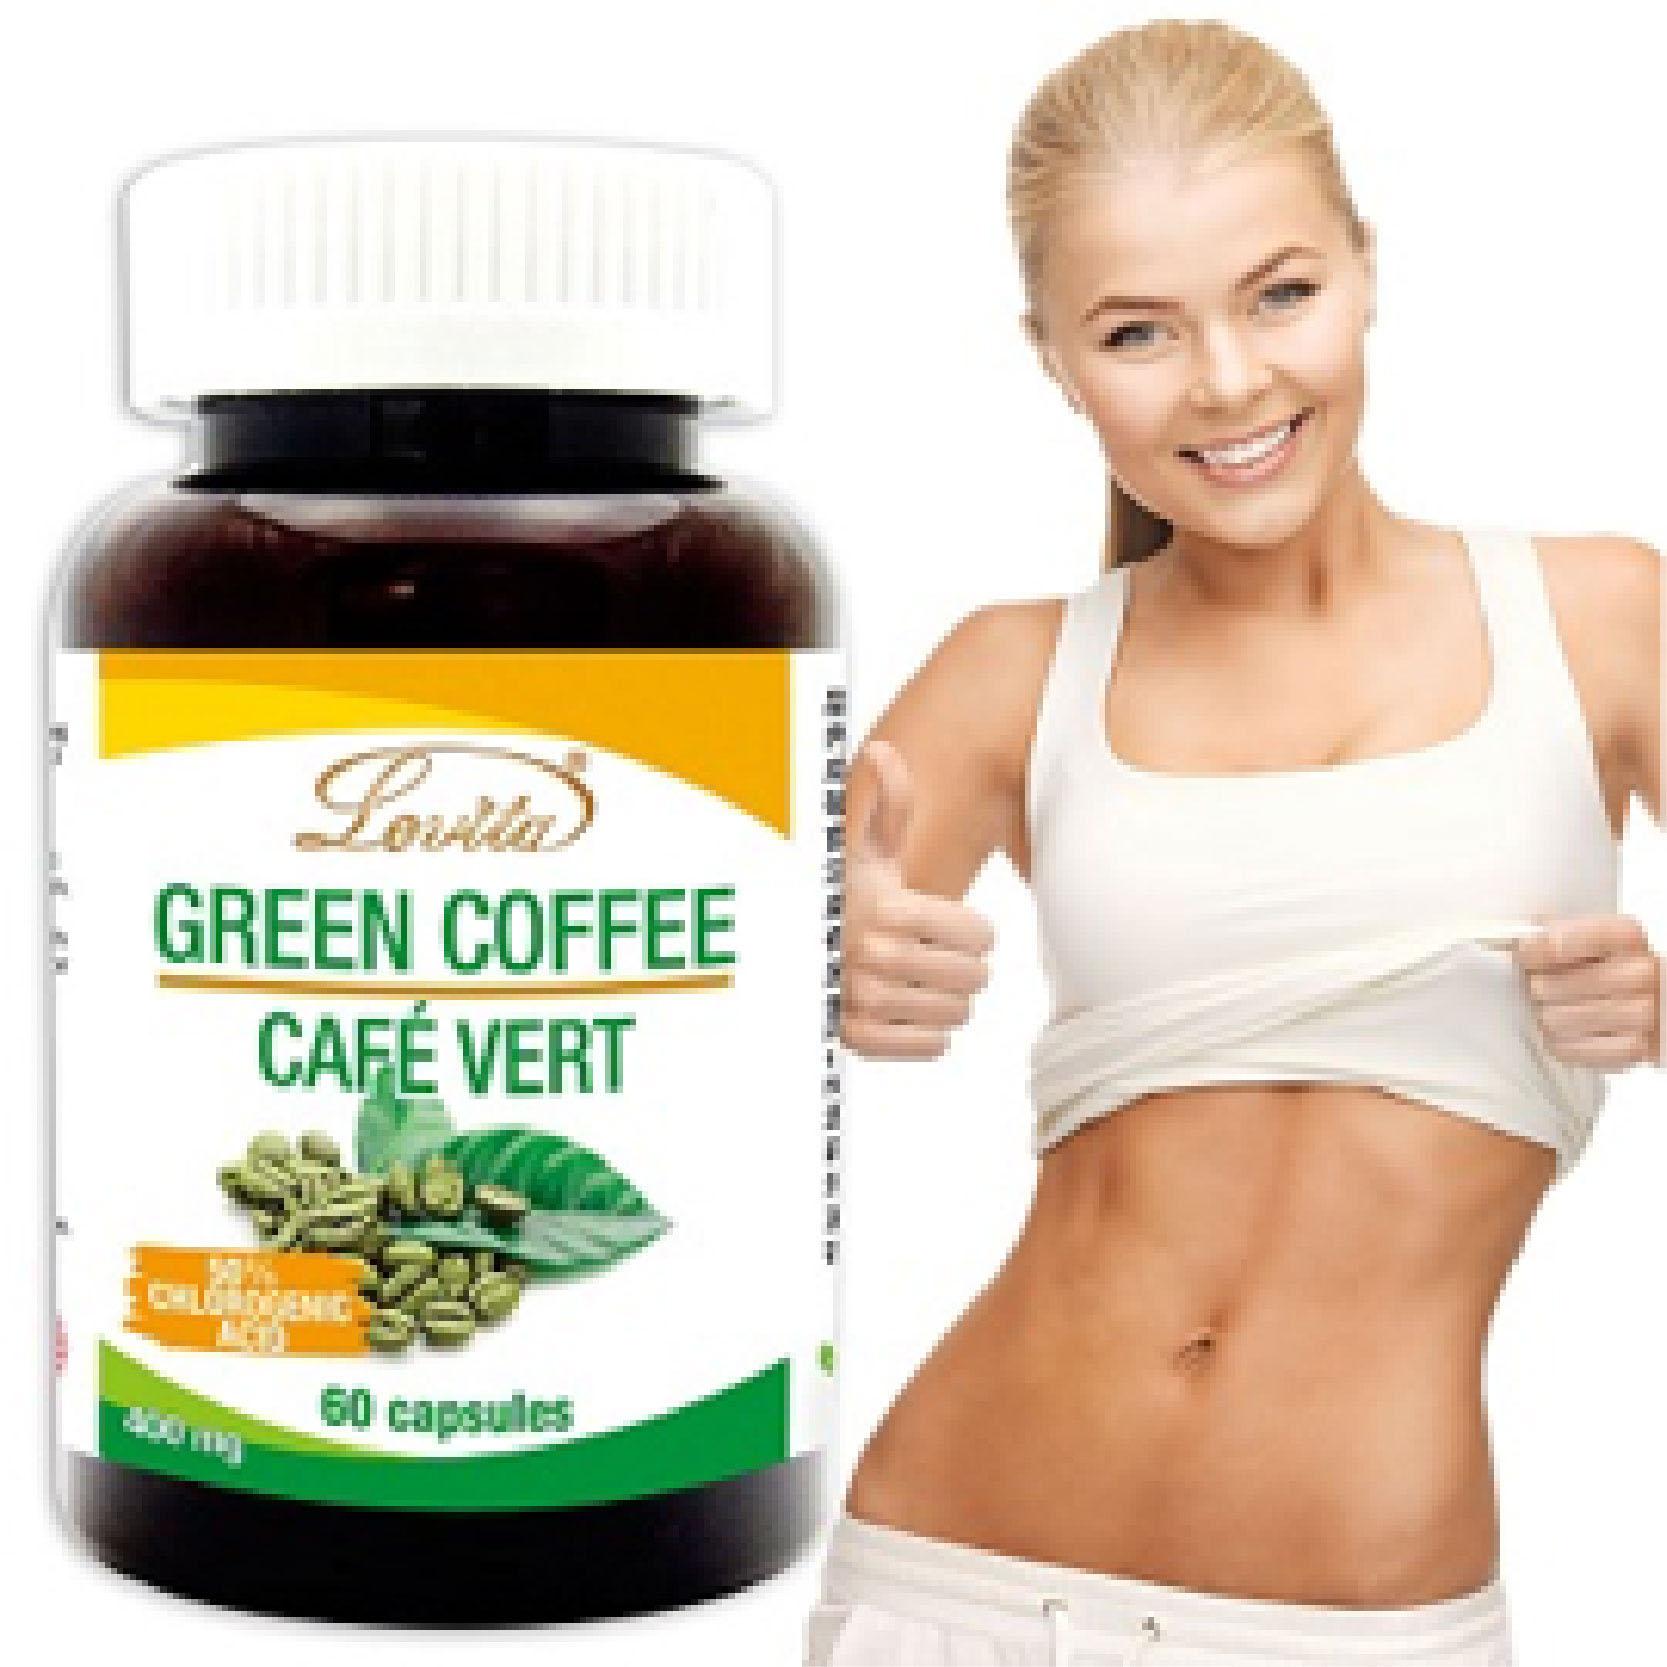 [Lovita 爱维他] 高单位绿咖啡400mg (60颗/瓶)